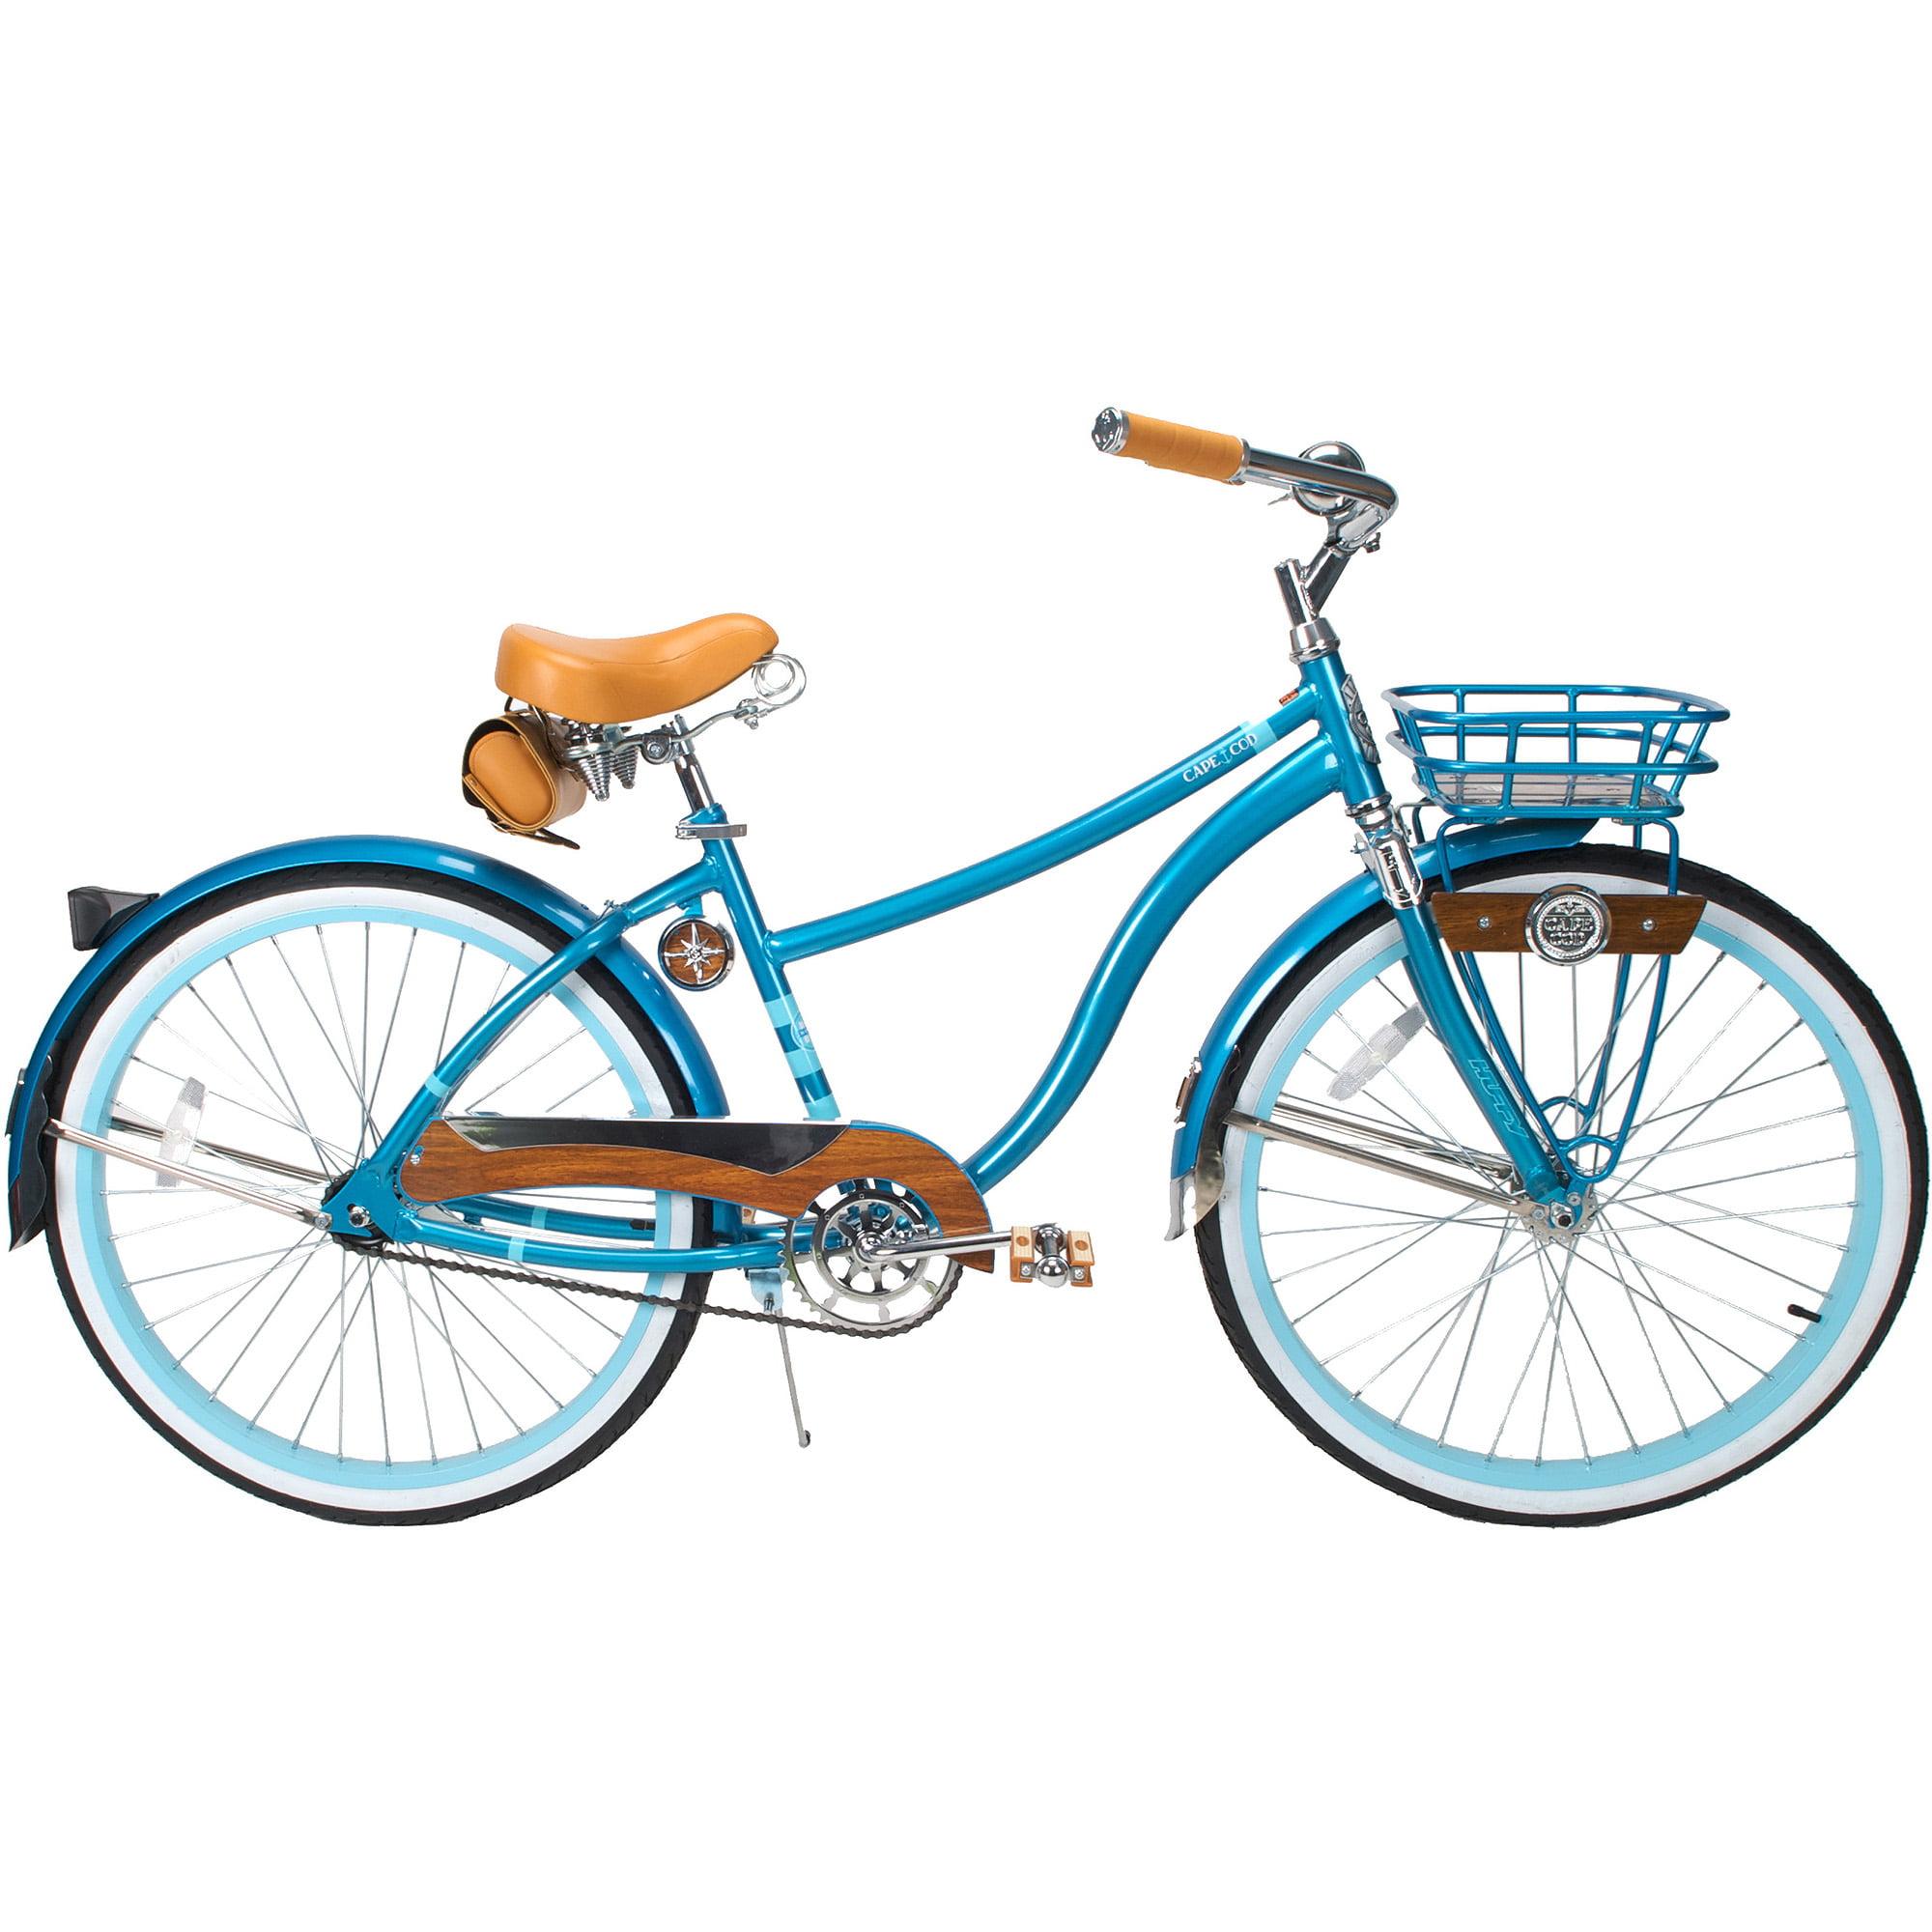 "26"" Huffy Cape Cod Women's Cruiser Bike, Metallic Aqua"